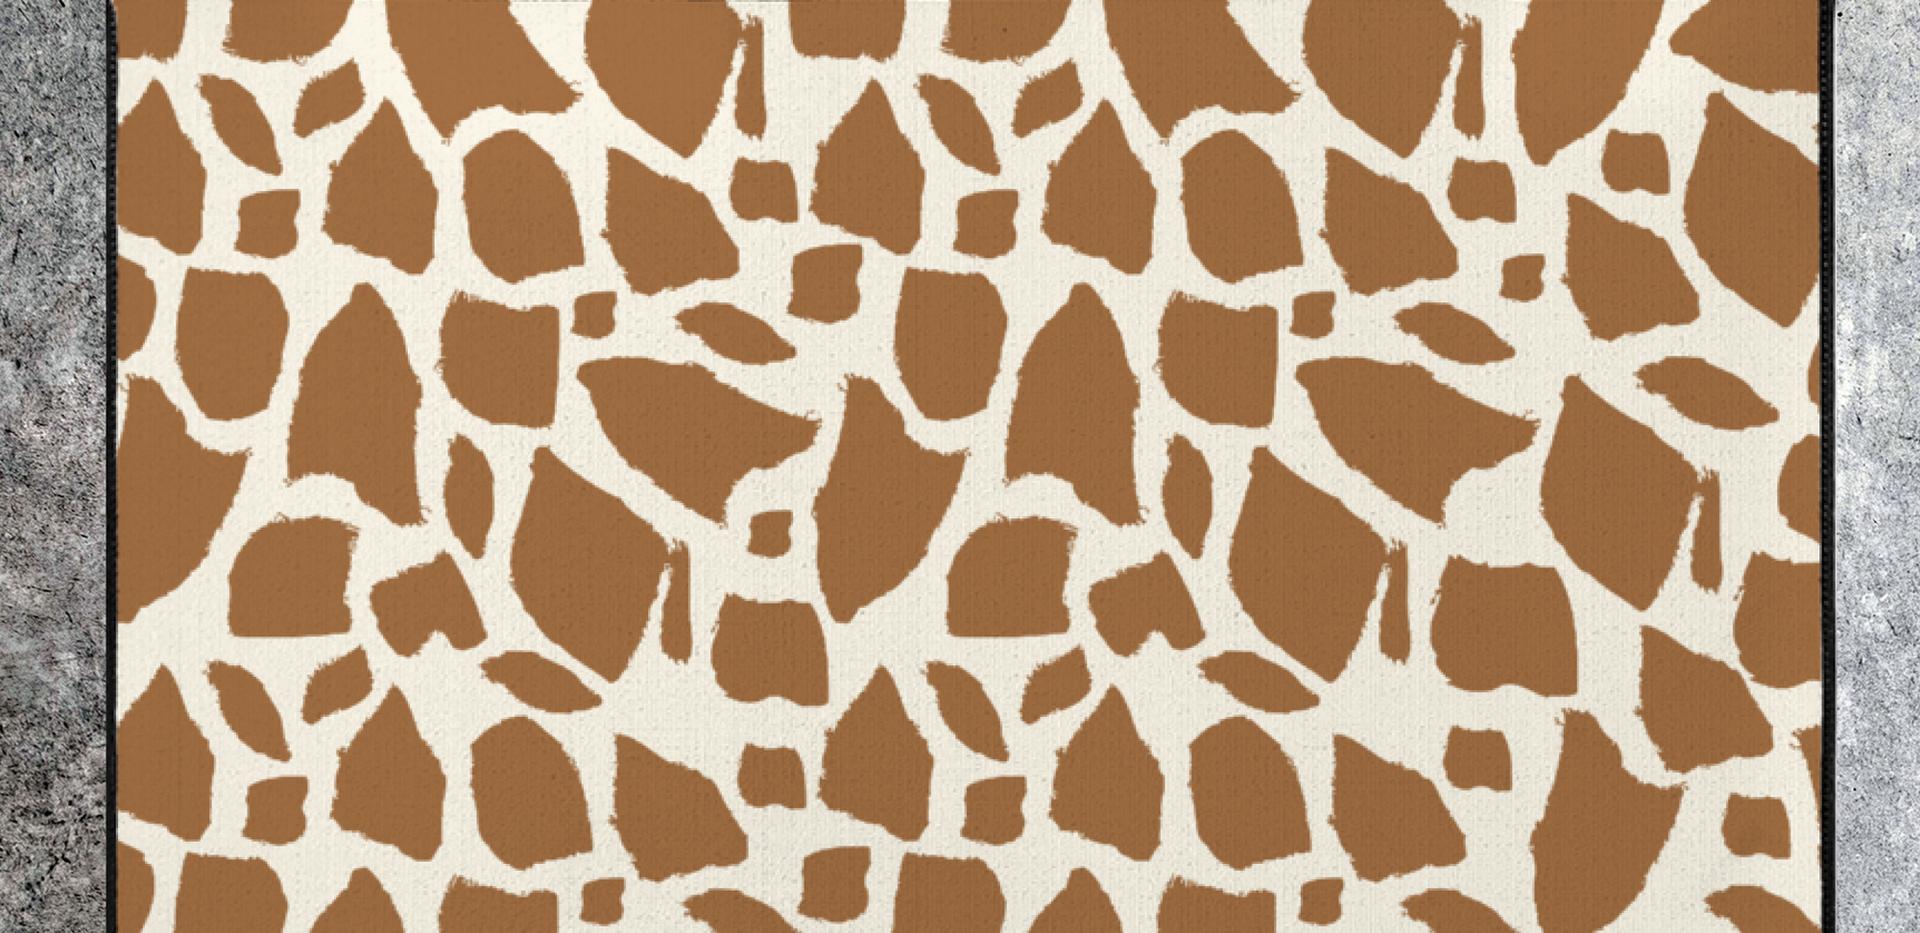 giraffe print rug starting at $35